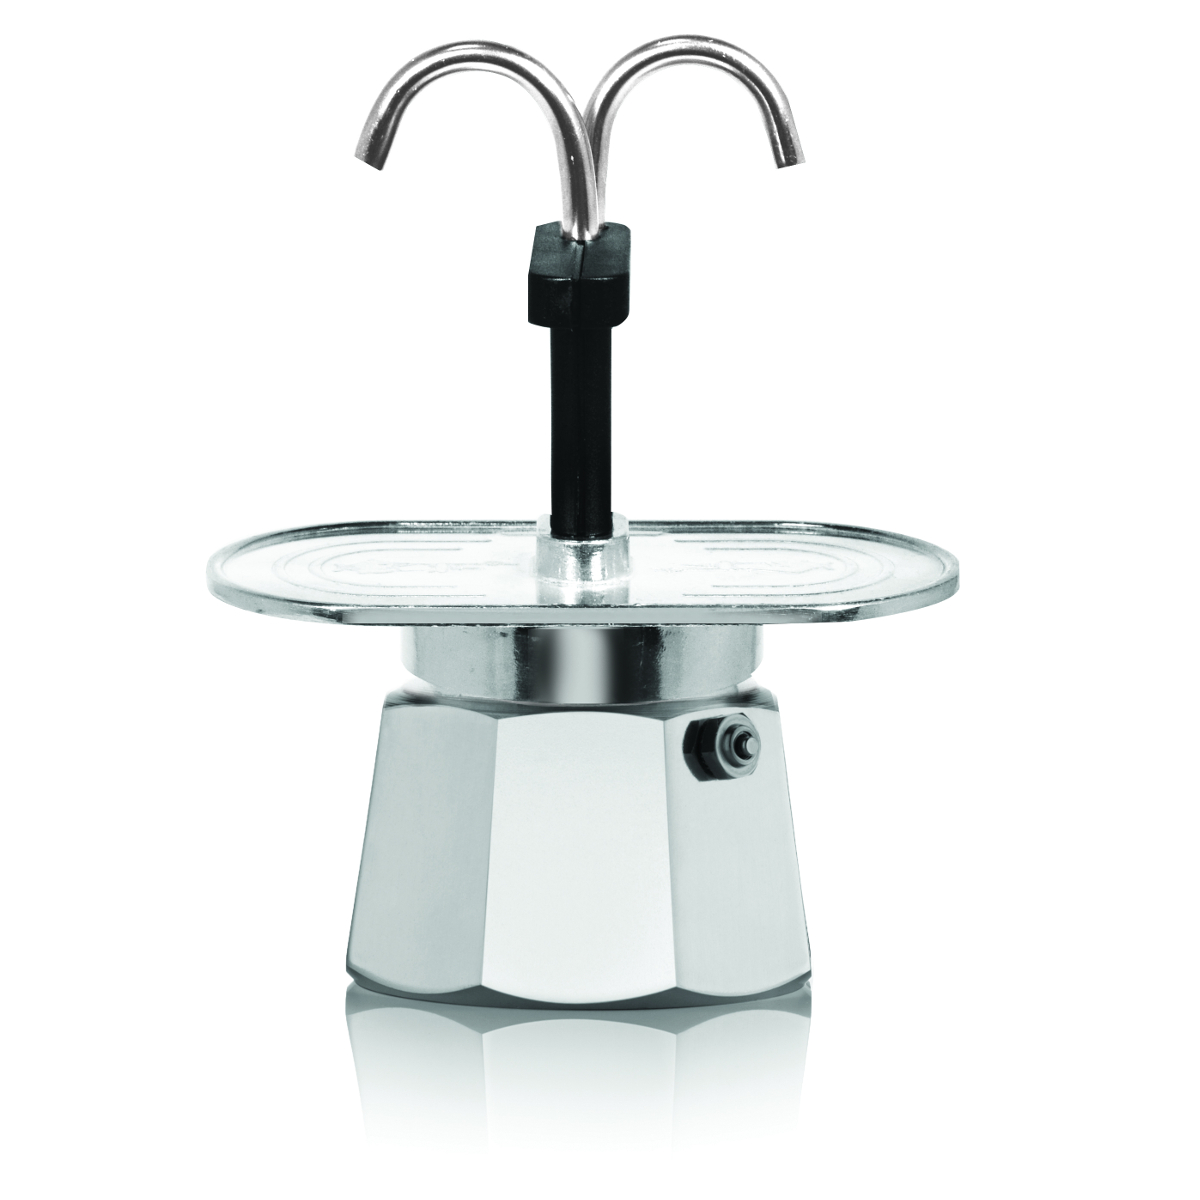 Bialetti Mini Express Aluminum 2 Cup Stovetop Moka Pot